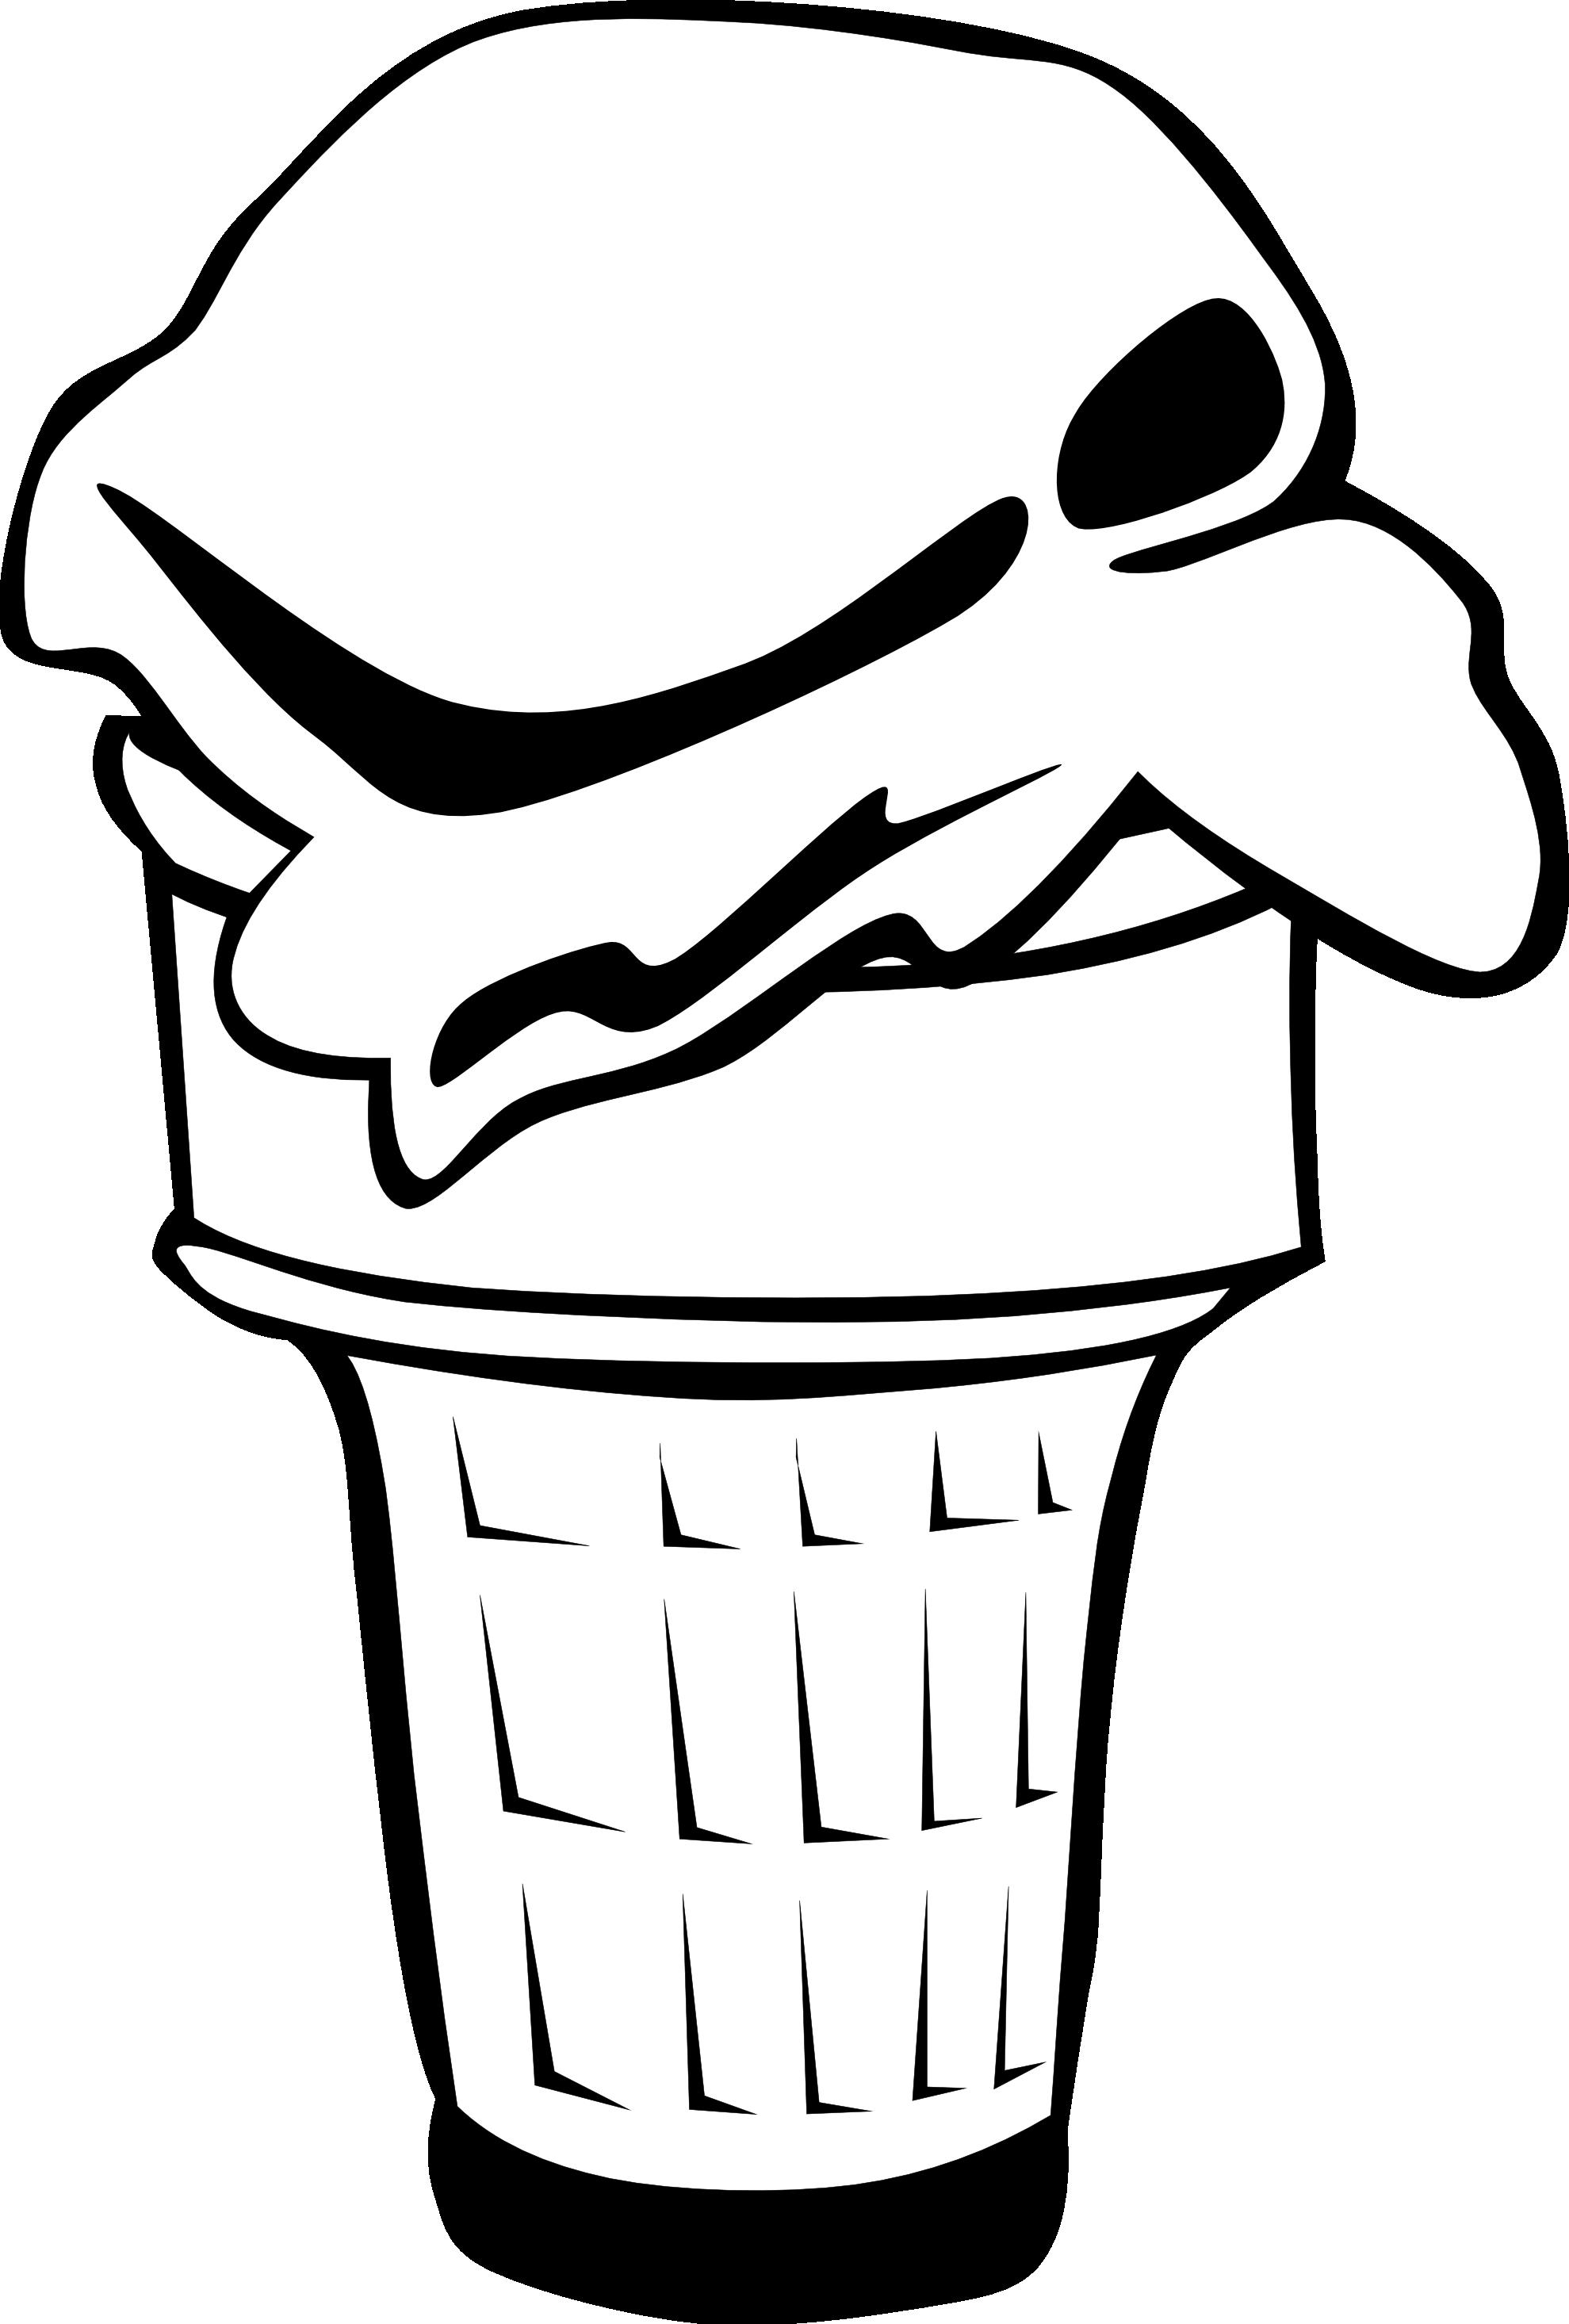 Vanilla clipart Clipart black%20and%20white%20ice%20cream%20cone%20clipart Black Ice Clipart